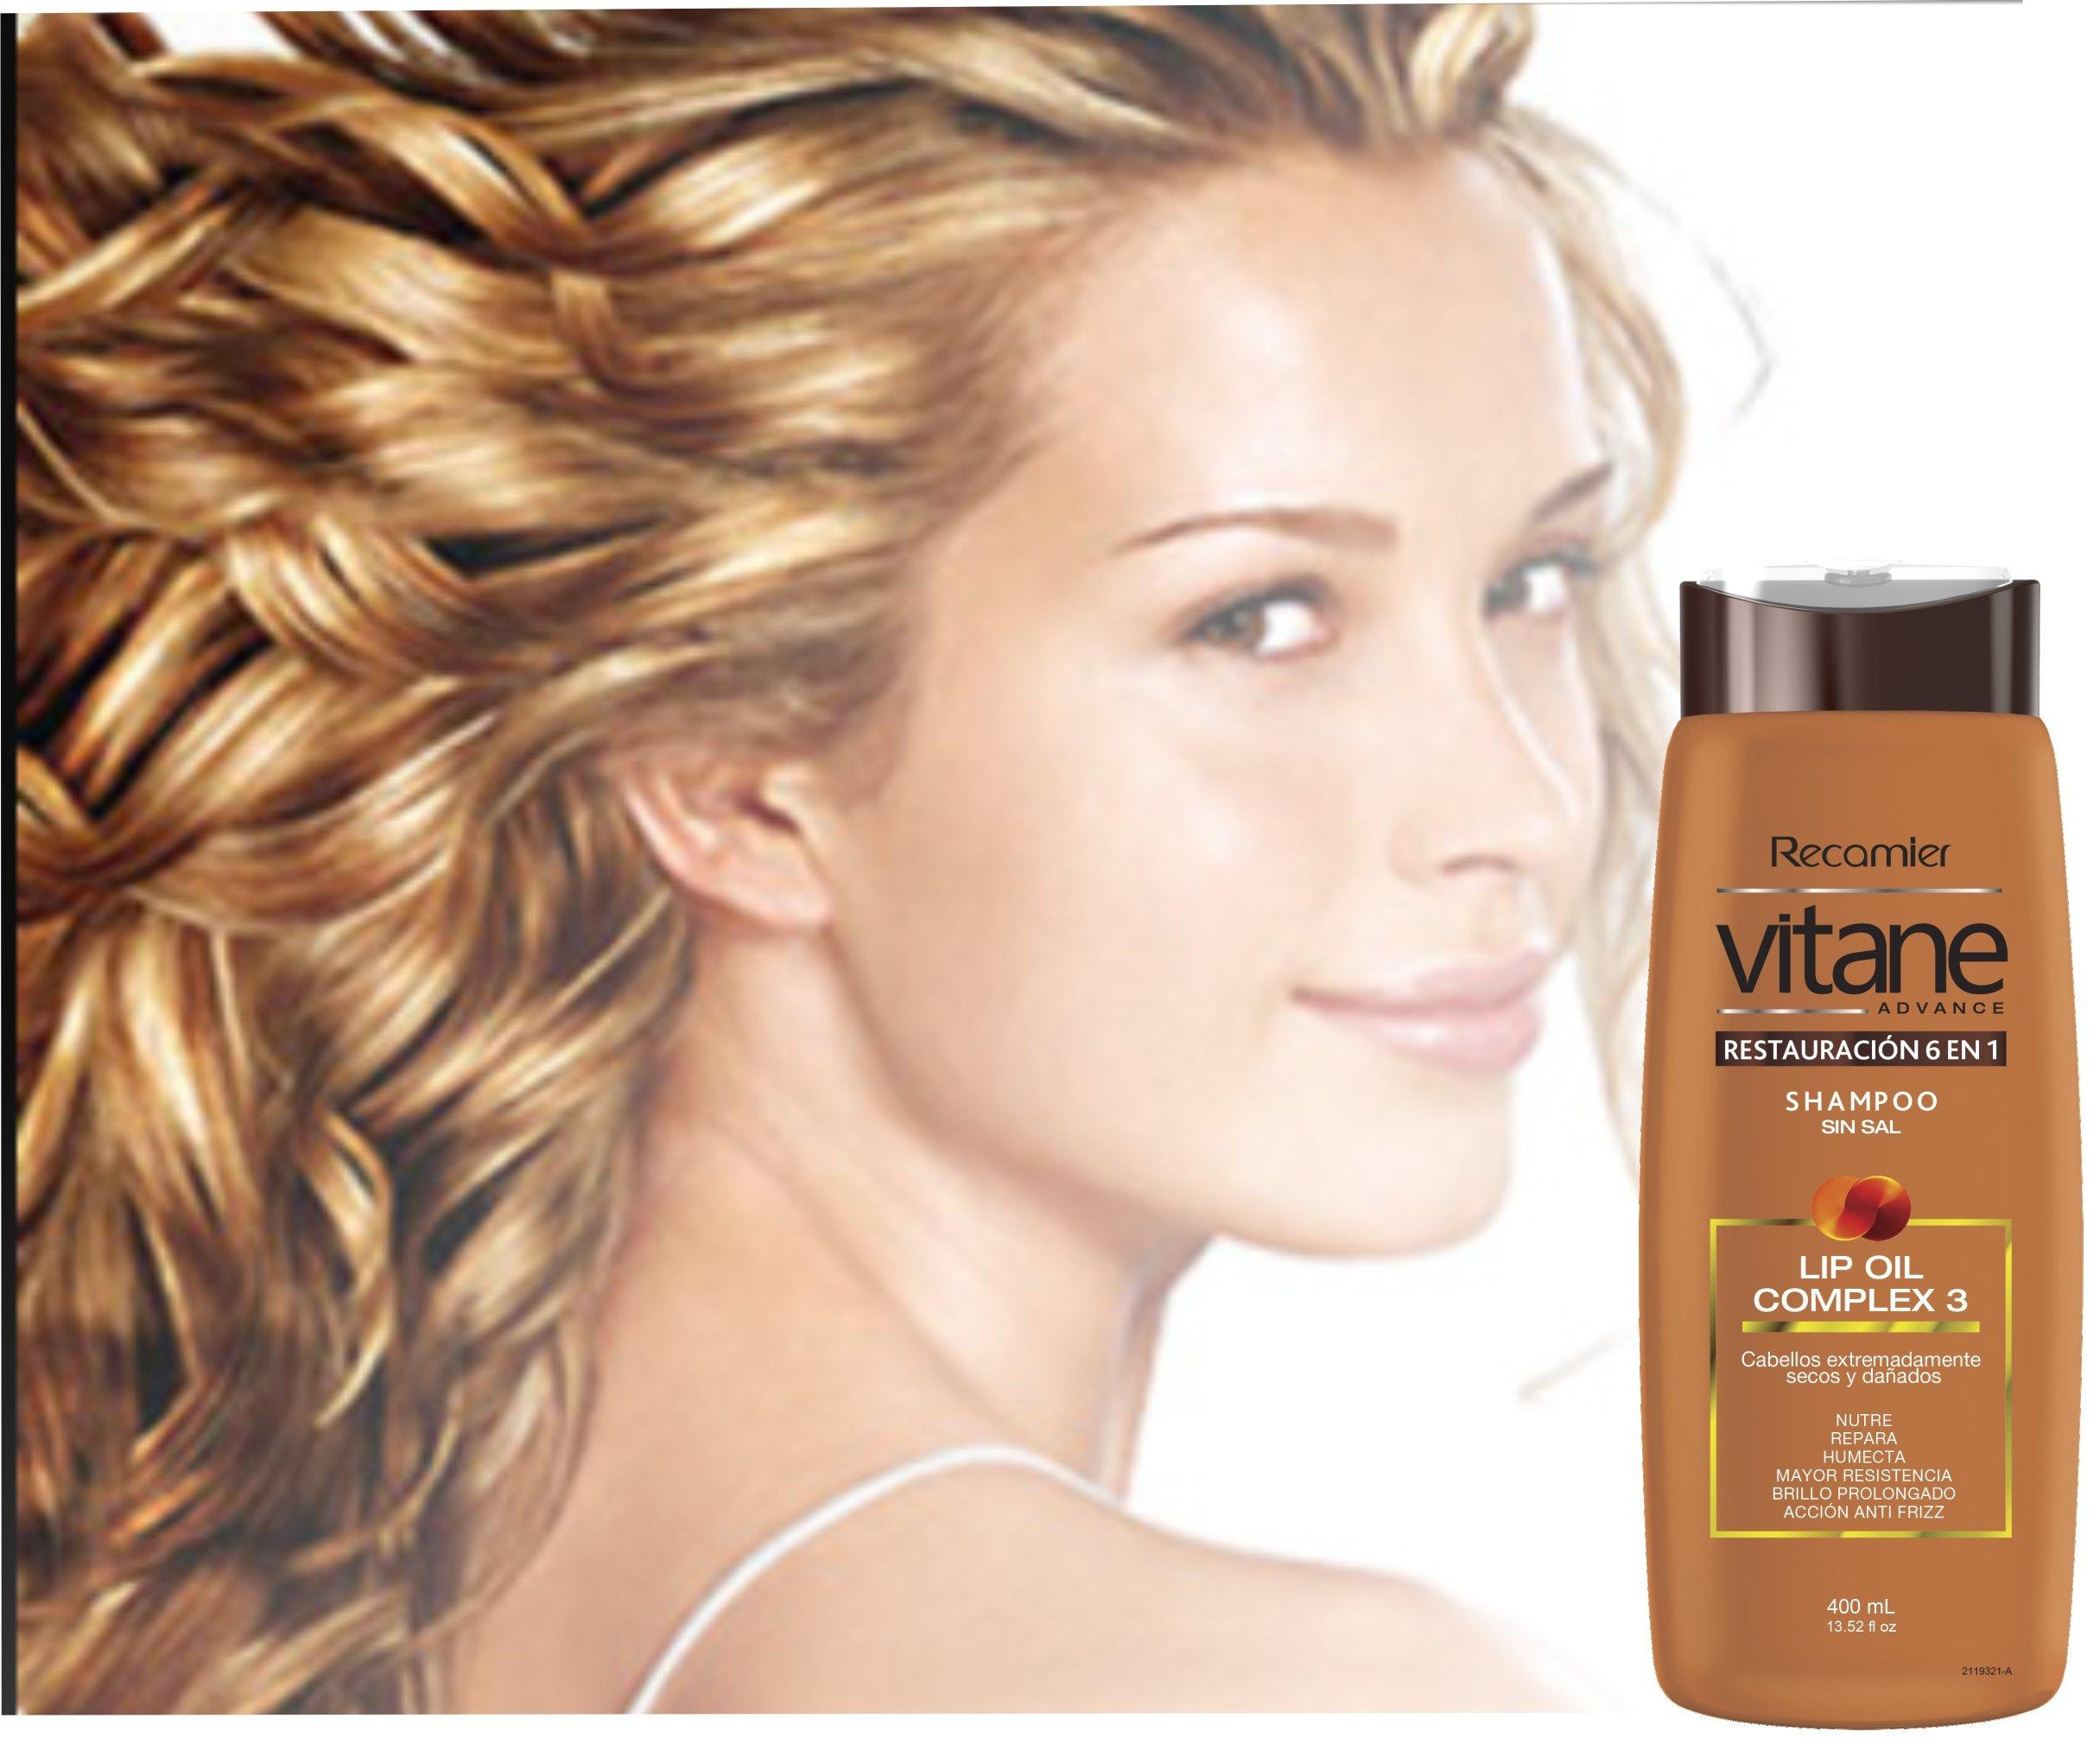 Vitane - shampoo restauracion 6 en 1, sin sal, cabellos super secos. /